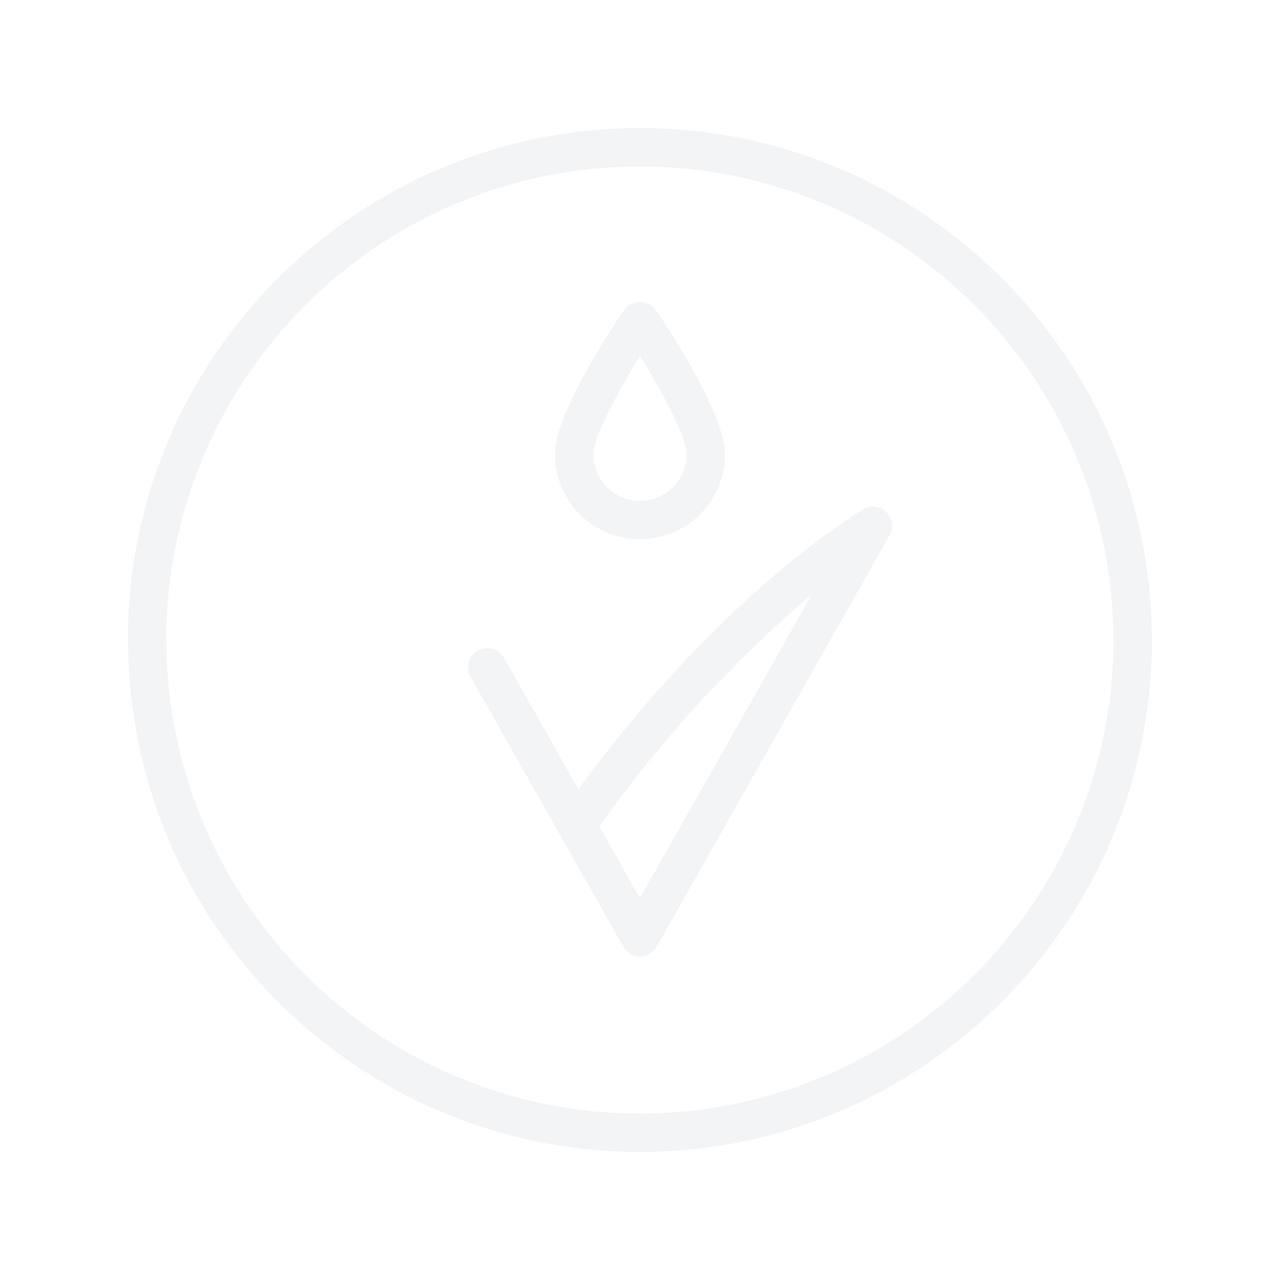 BATISTE Dry Shampoo Cherry